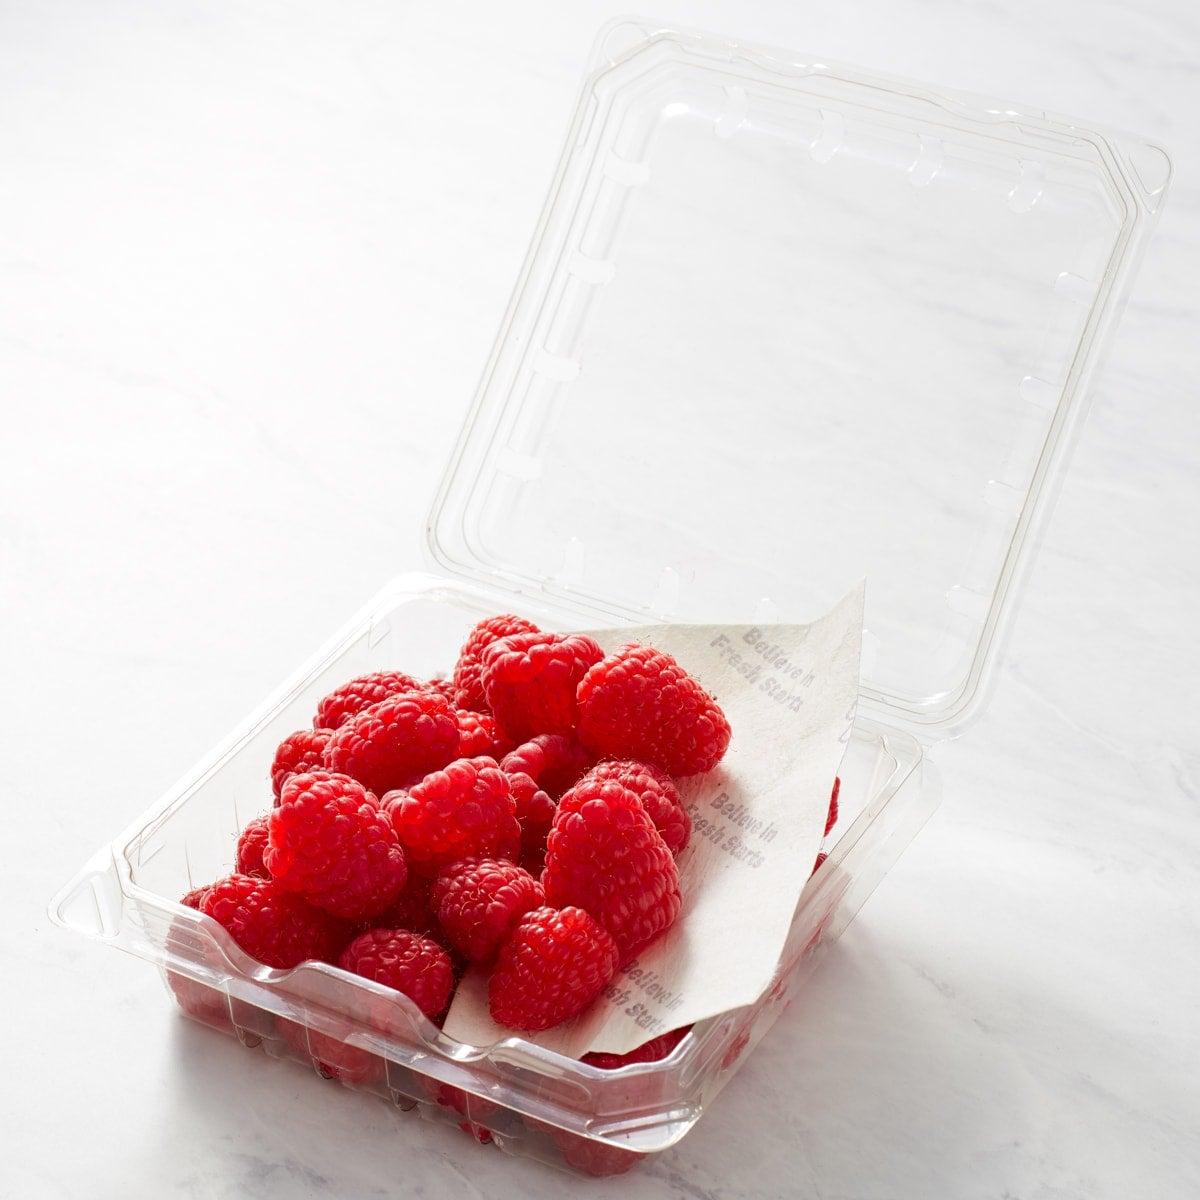 WW FRESHPAPER Food Saver Sheets - alternate view 3